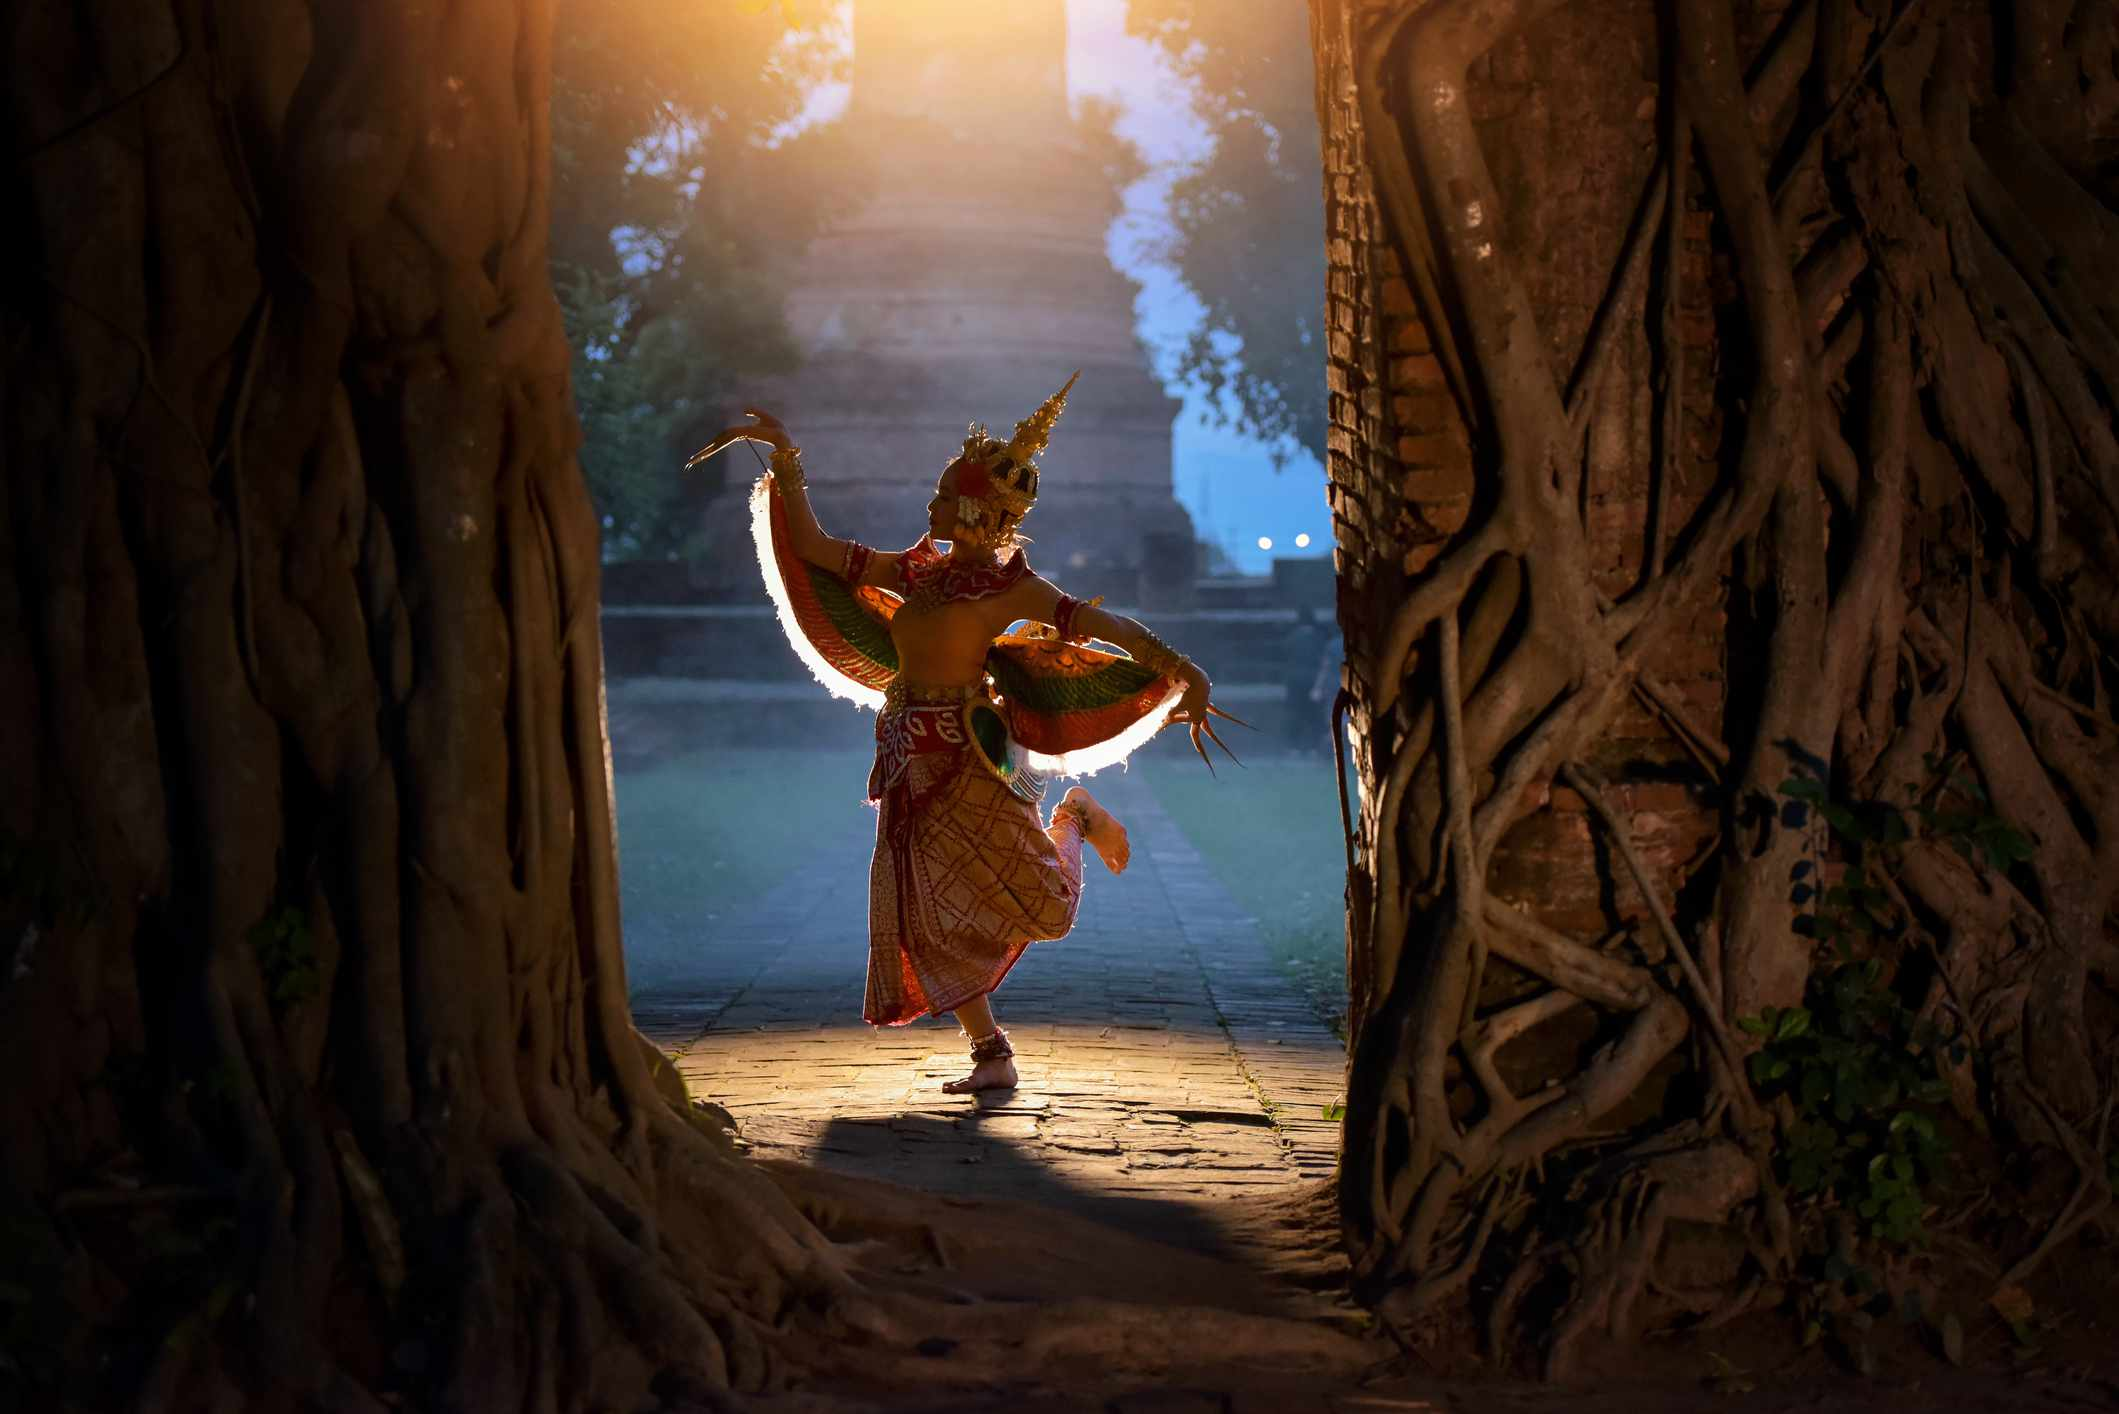 young girl Thai Dancing art, pantomime performances action, Thailand